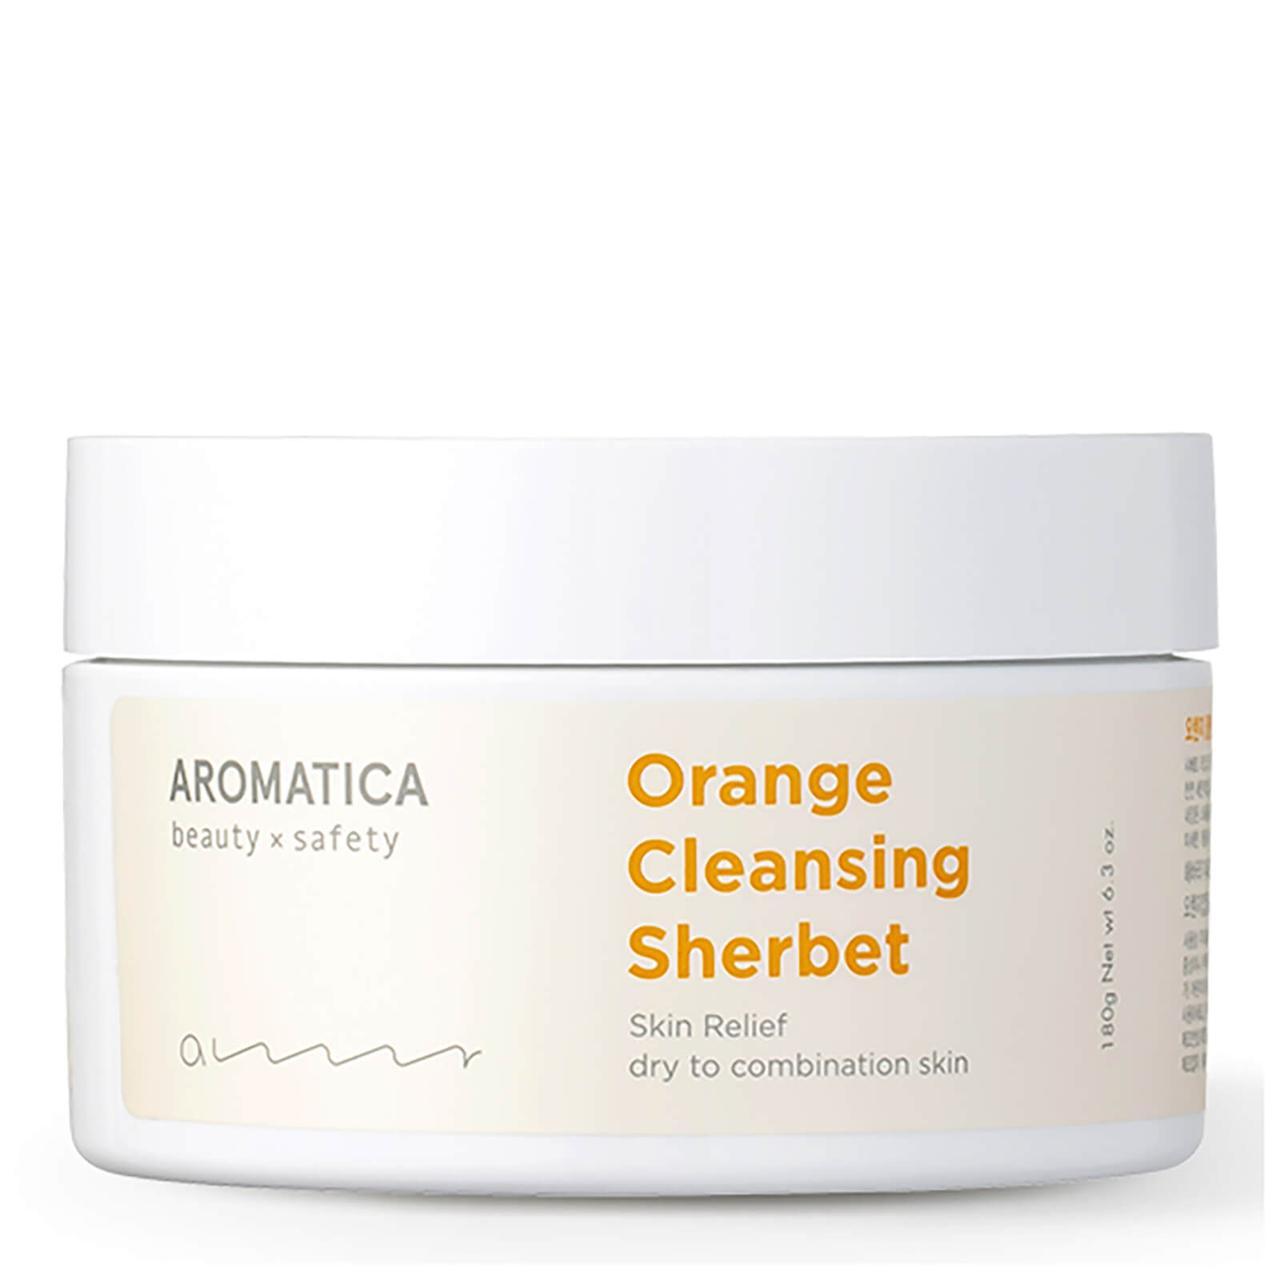 Очищающий щербет Aromatica Orange Cleansing Sherbet, 180 мл